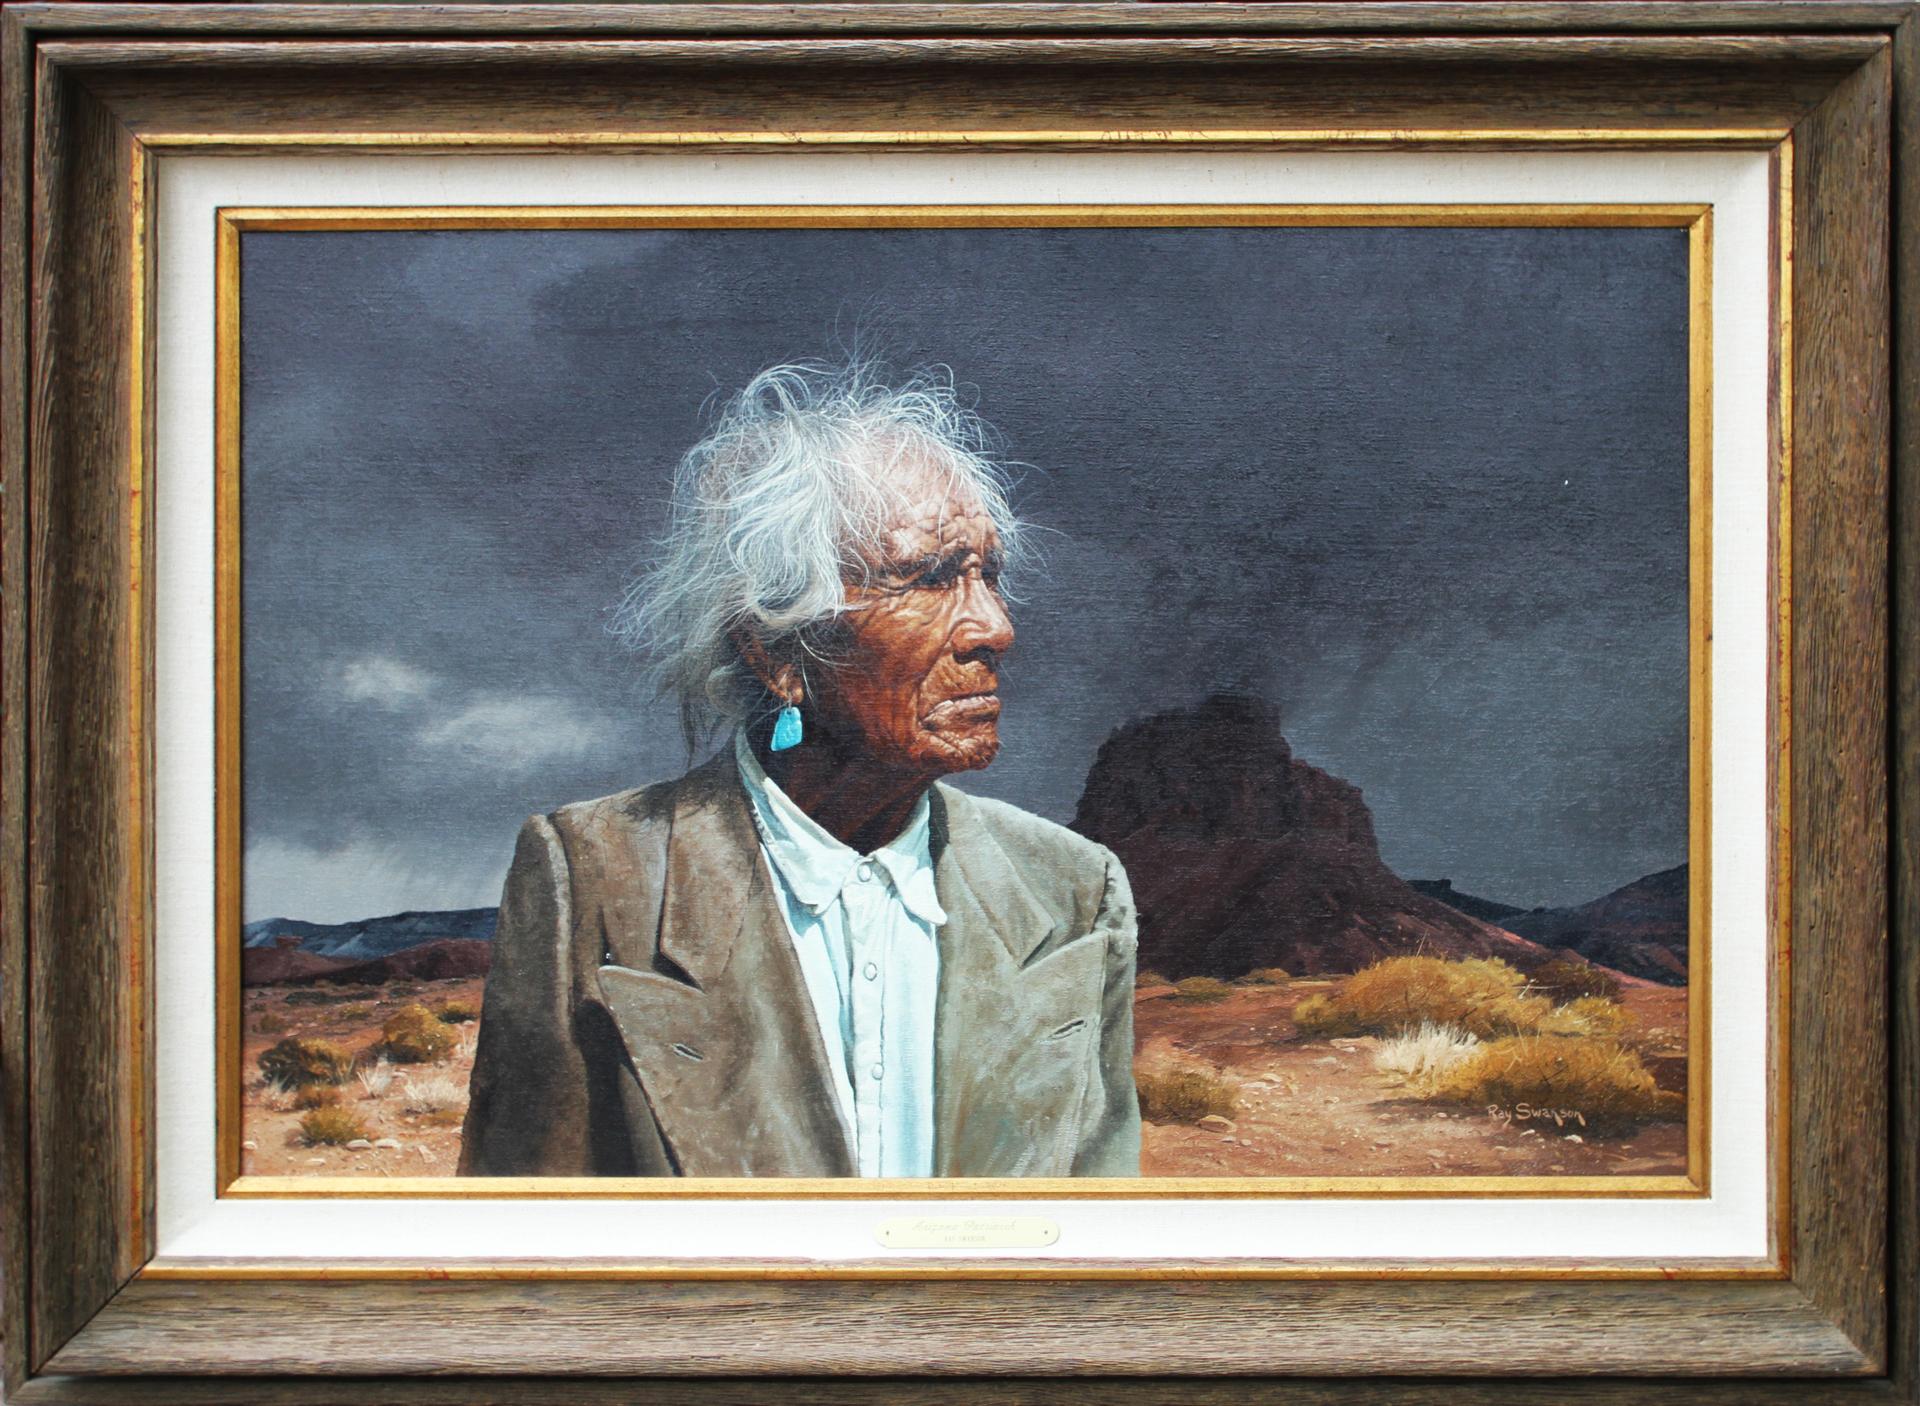 Arizona Patriarch by Ray Swanson